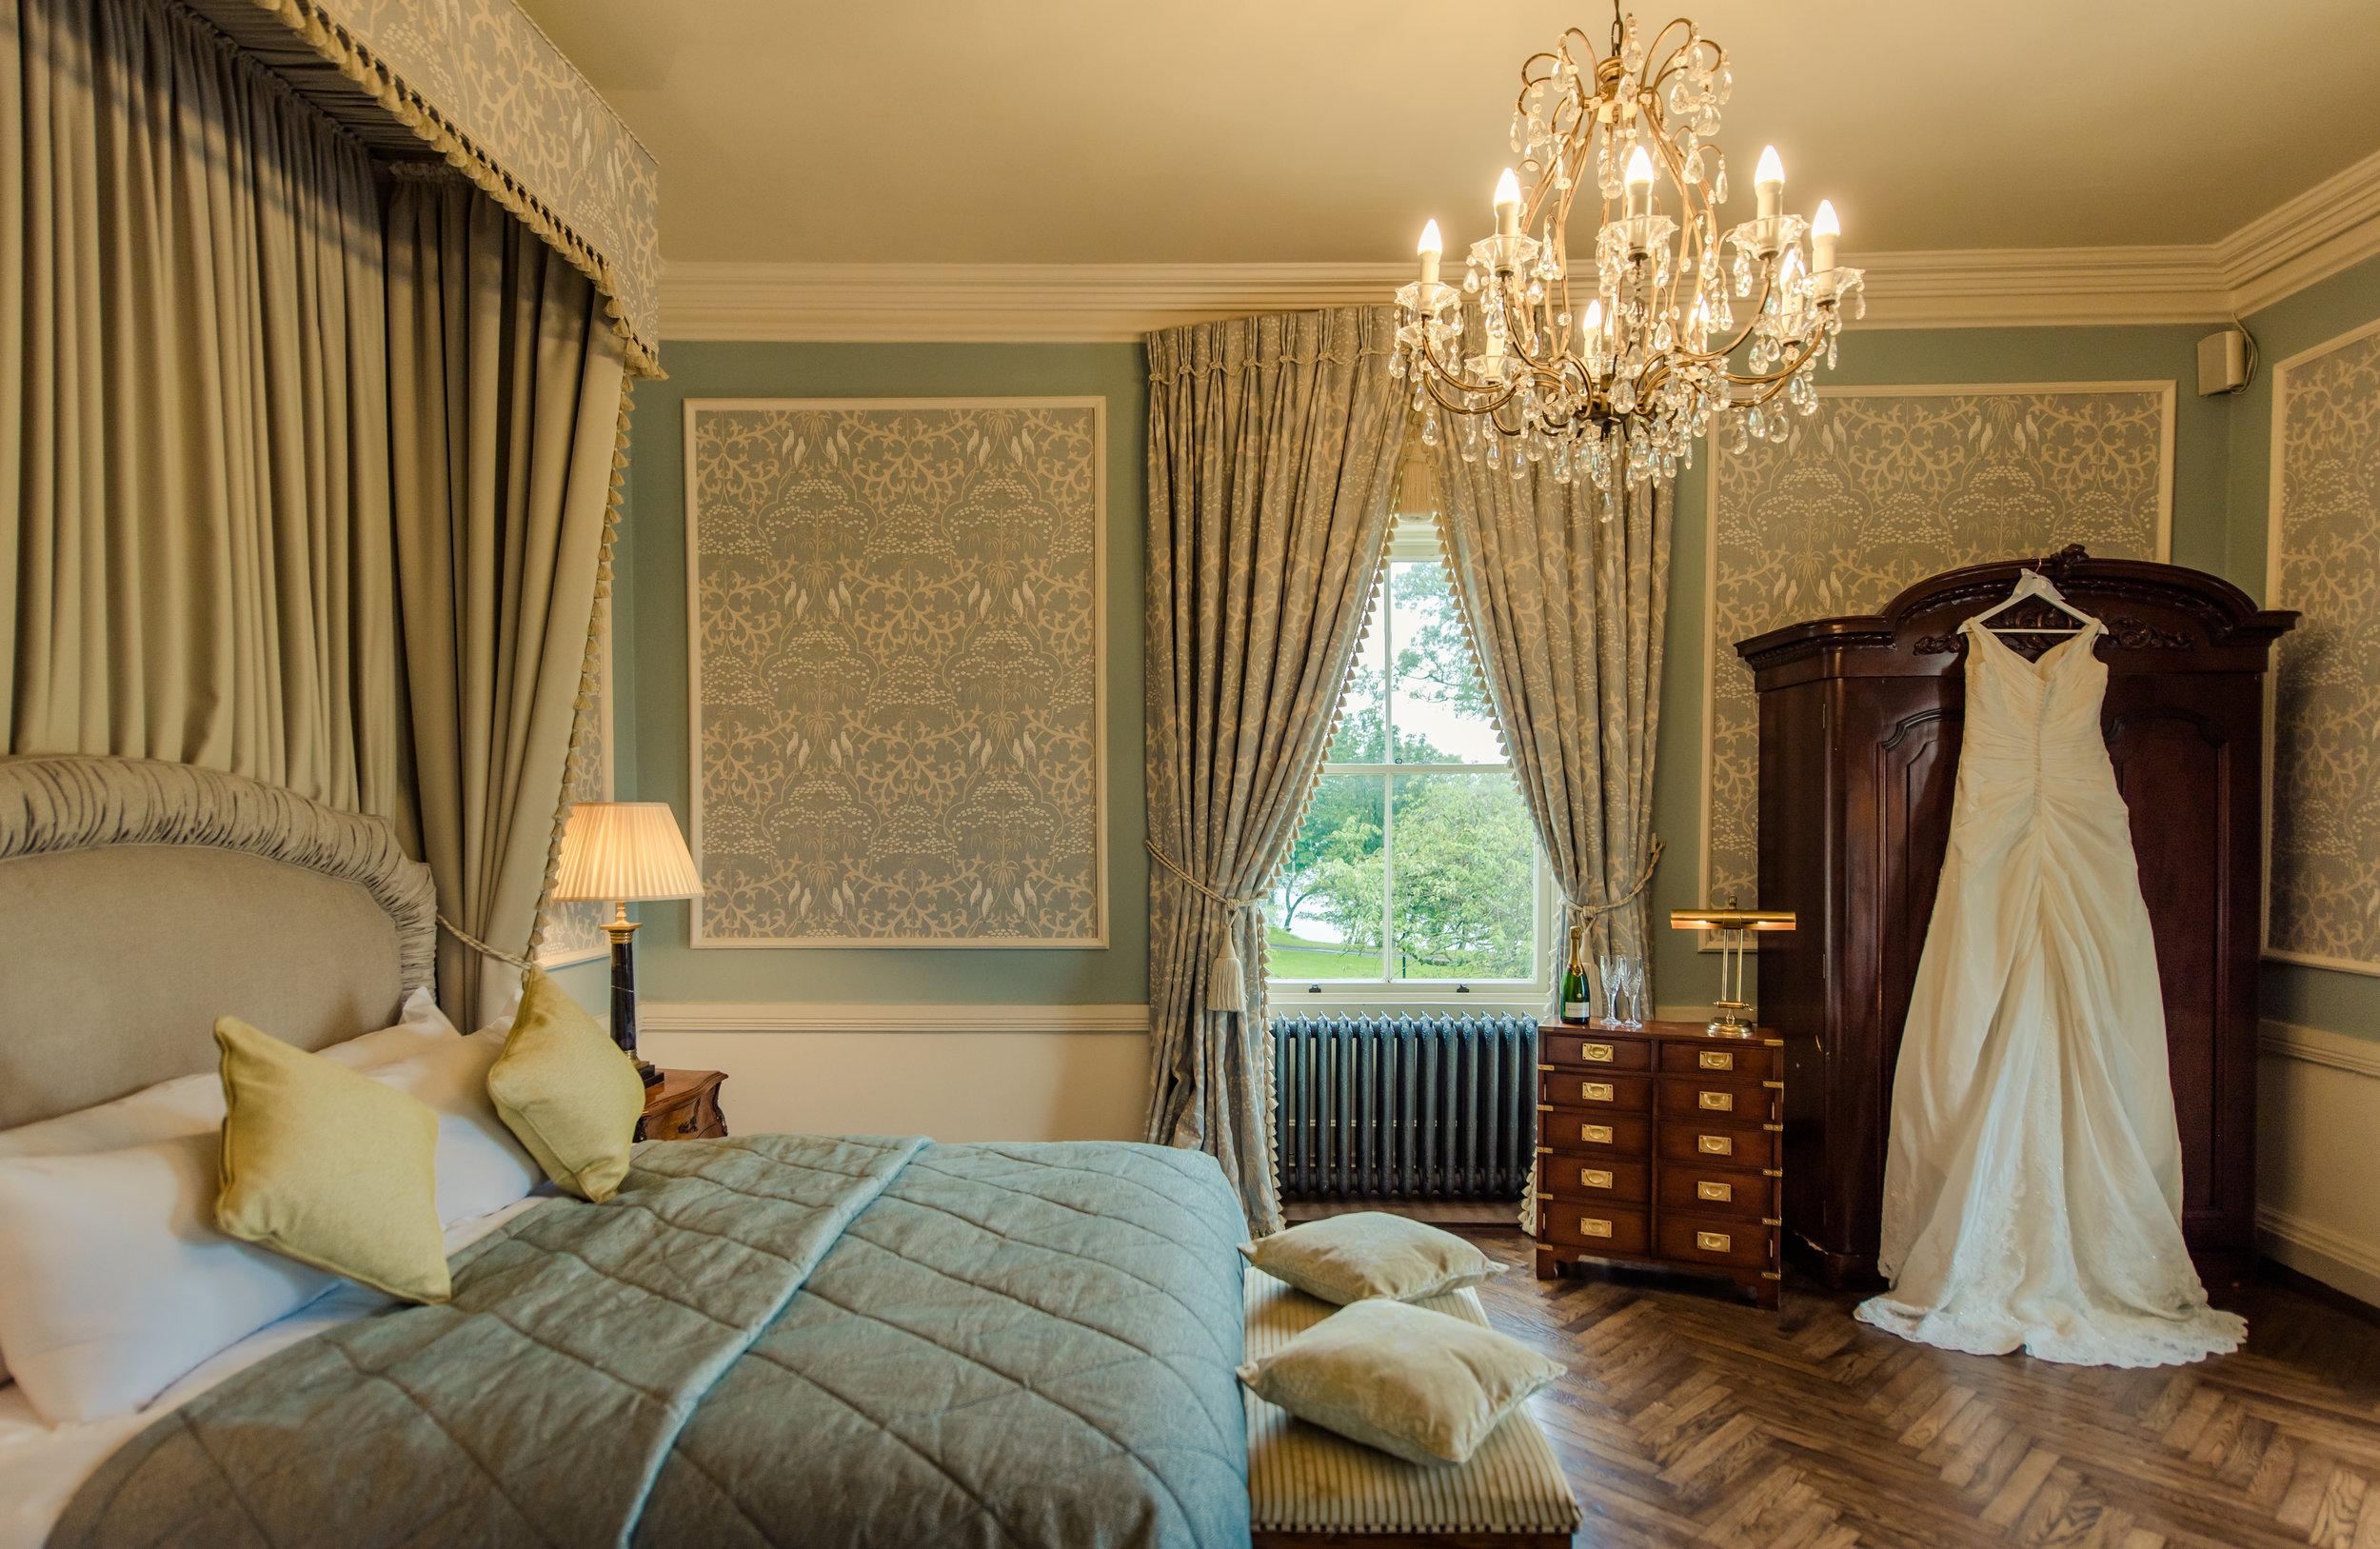 Tulfarris Hotel & Golf Resort Wych Hazel bridal suite with wedding dress.jpg